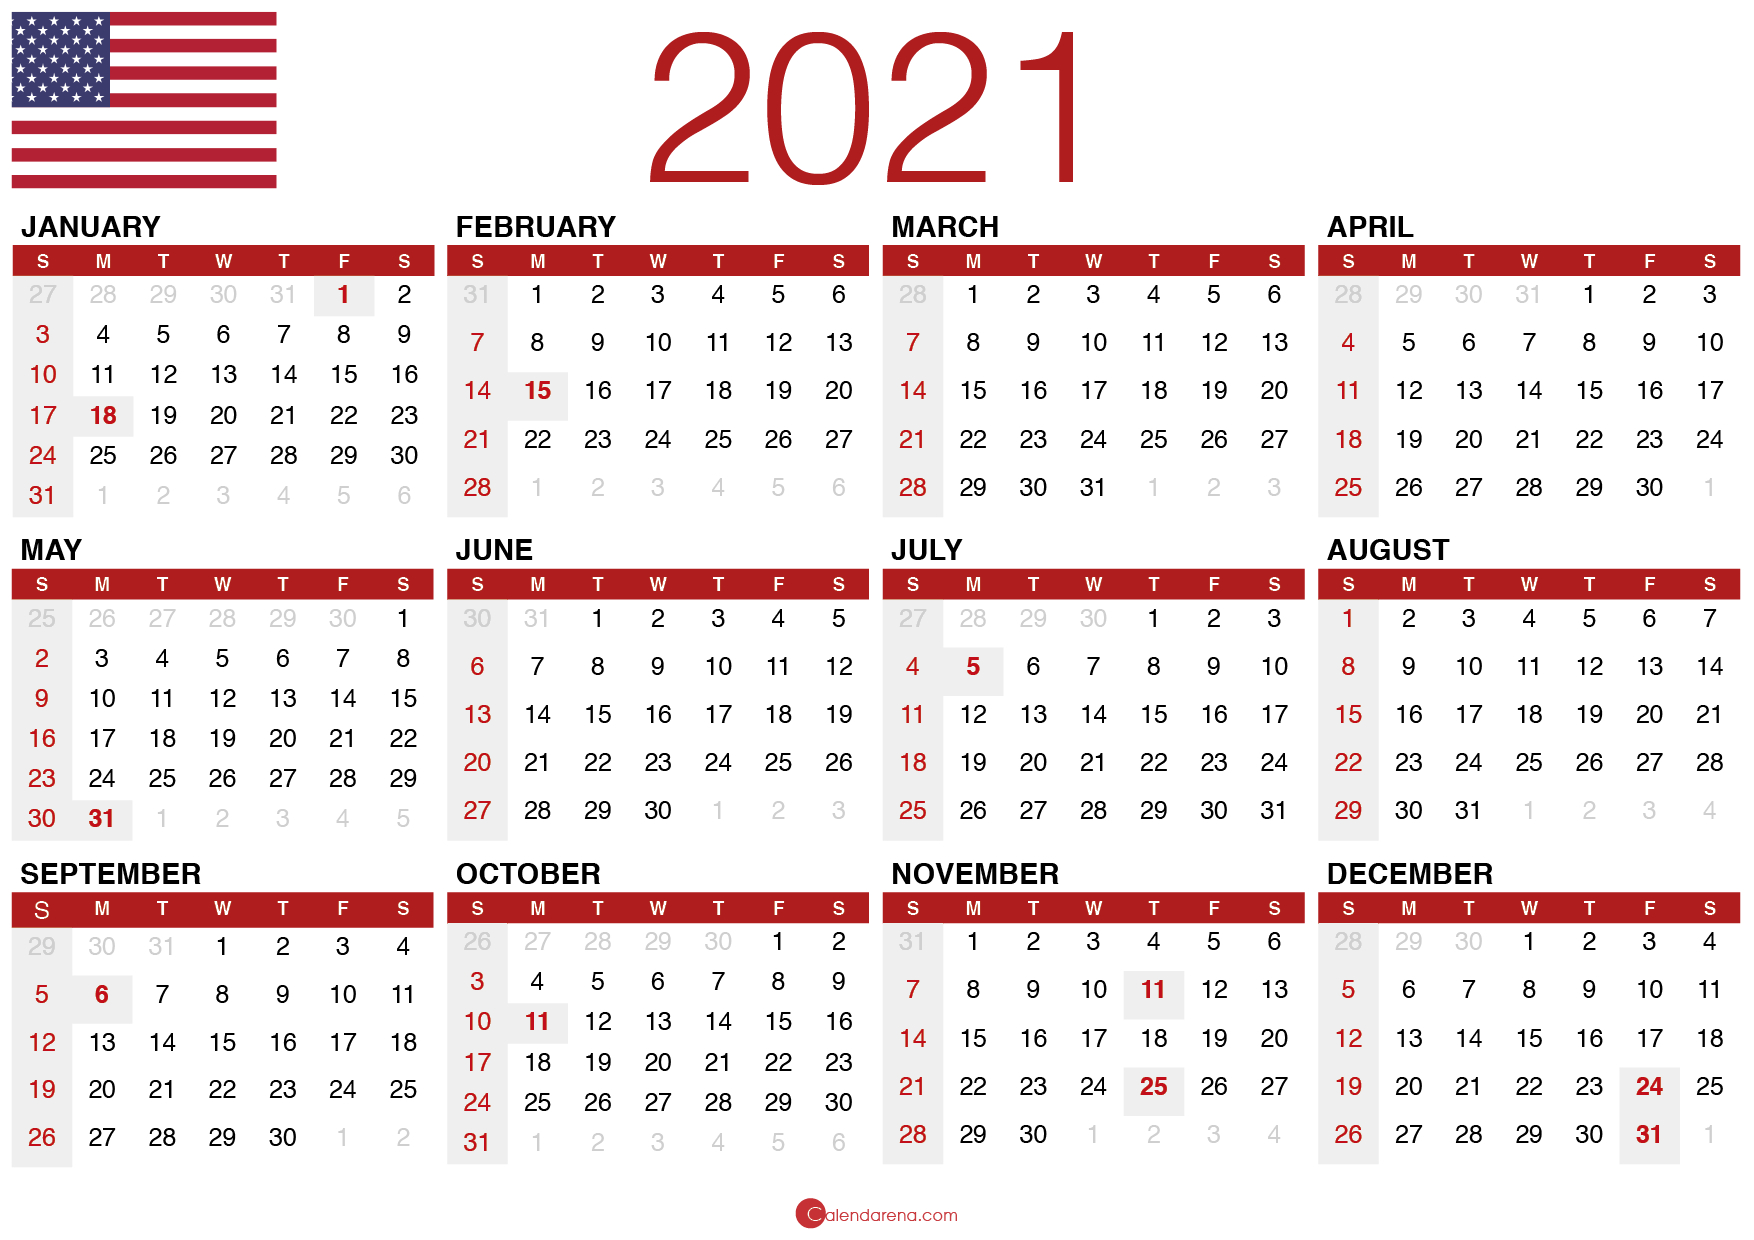 Download Free Printable Calendar 2021 🇺🇸 - Calendarena